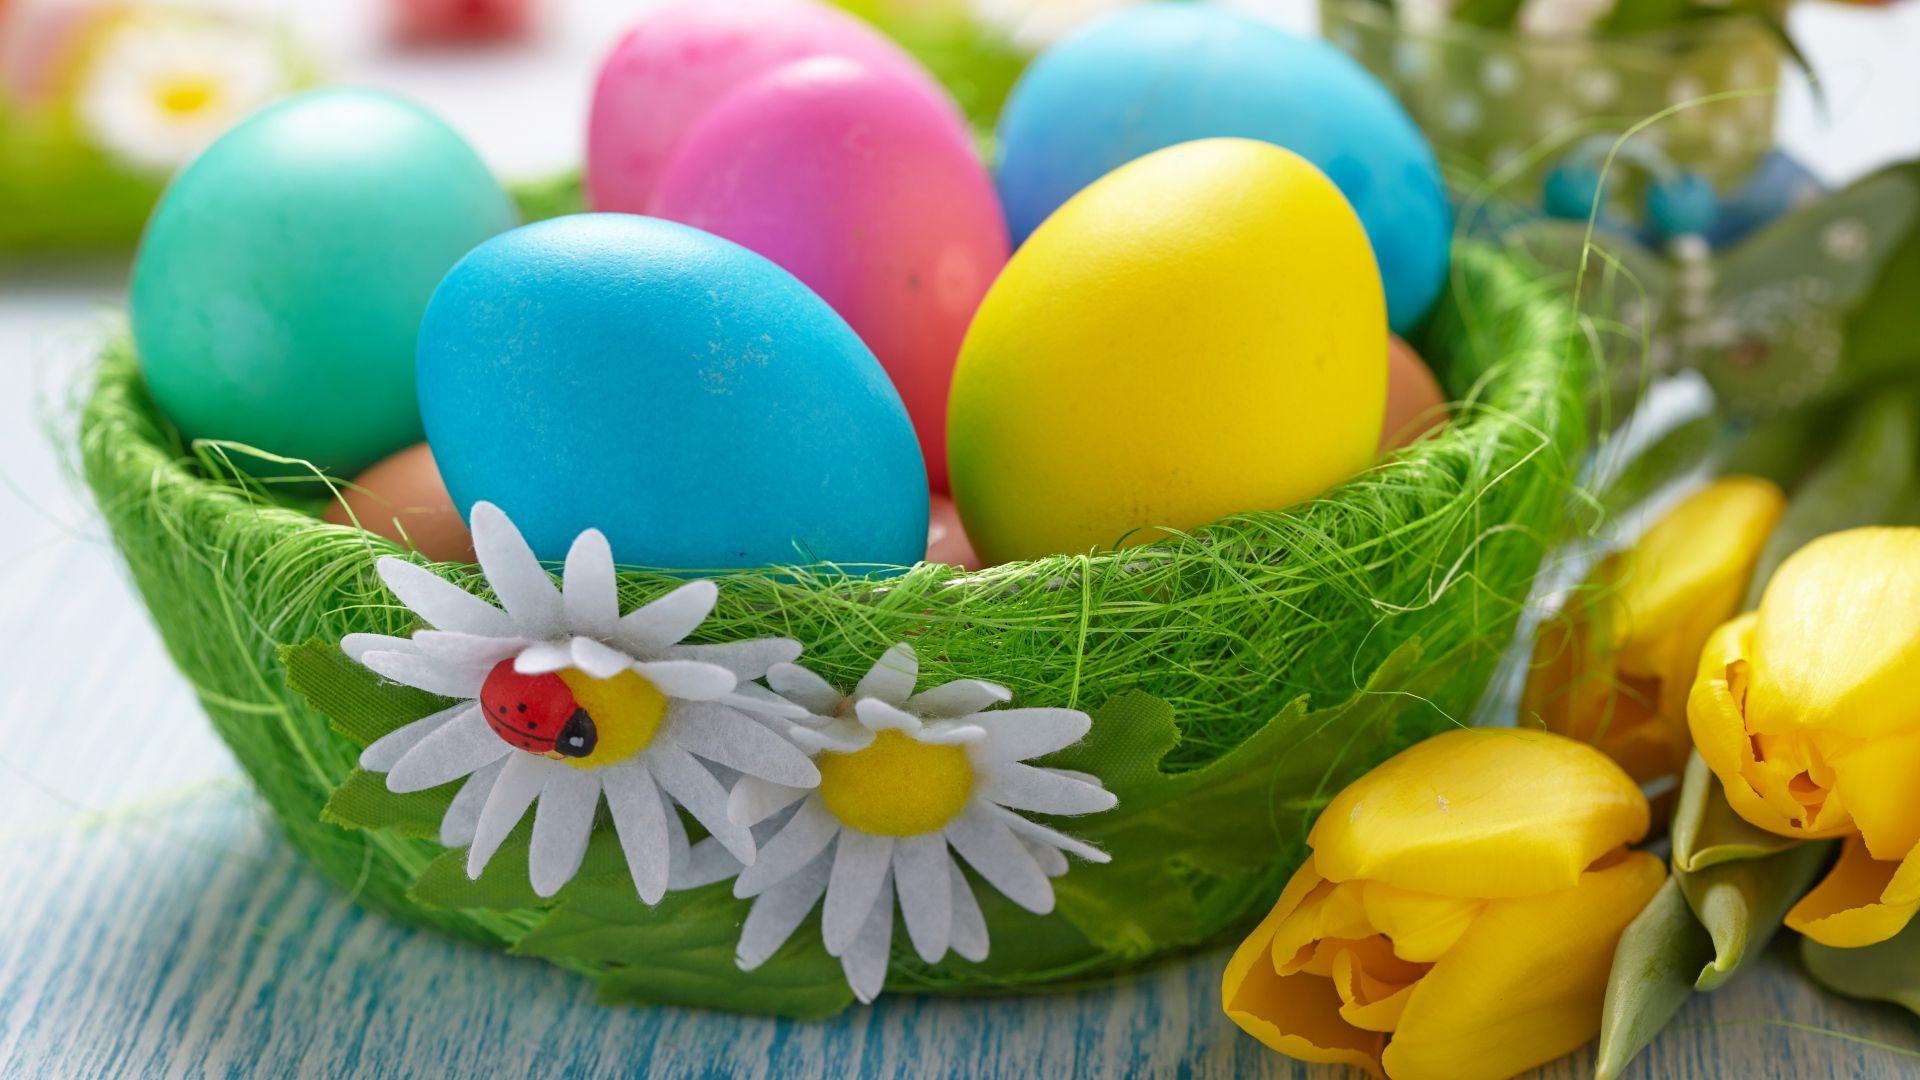 Great Basket Flowers Tulips Easter Easter Eggs Wallpaper